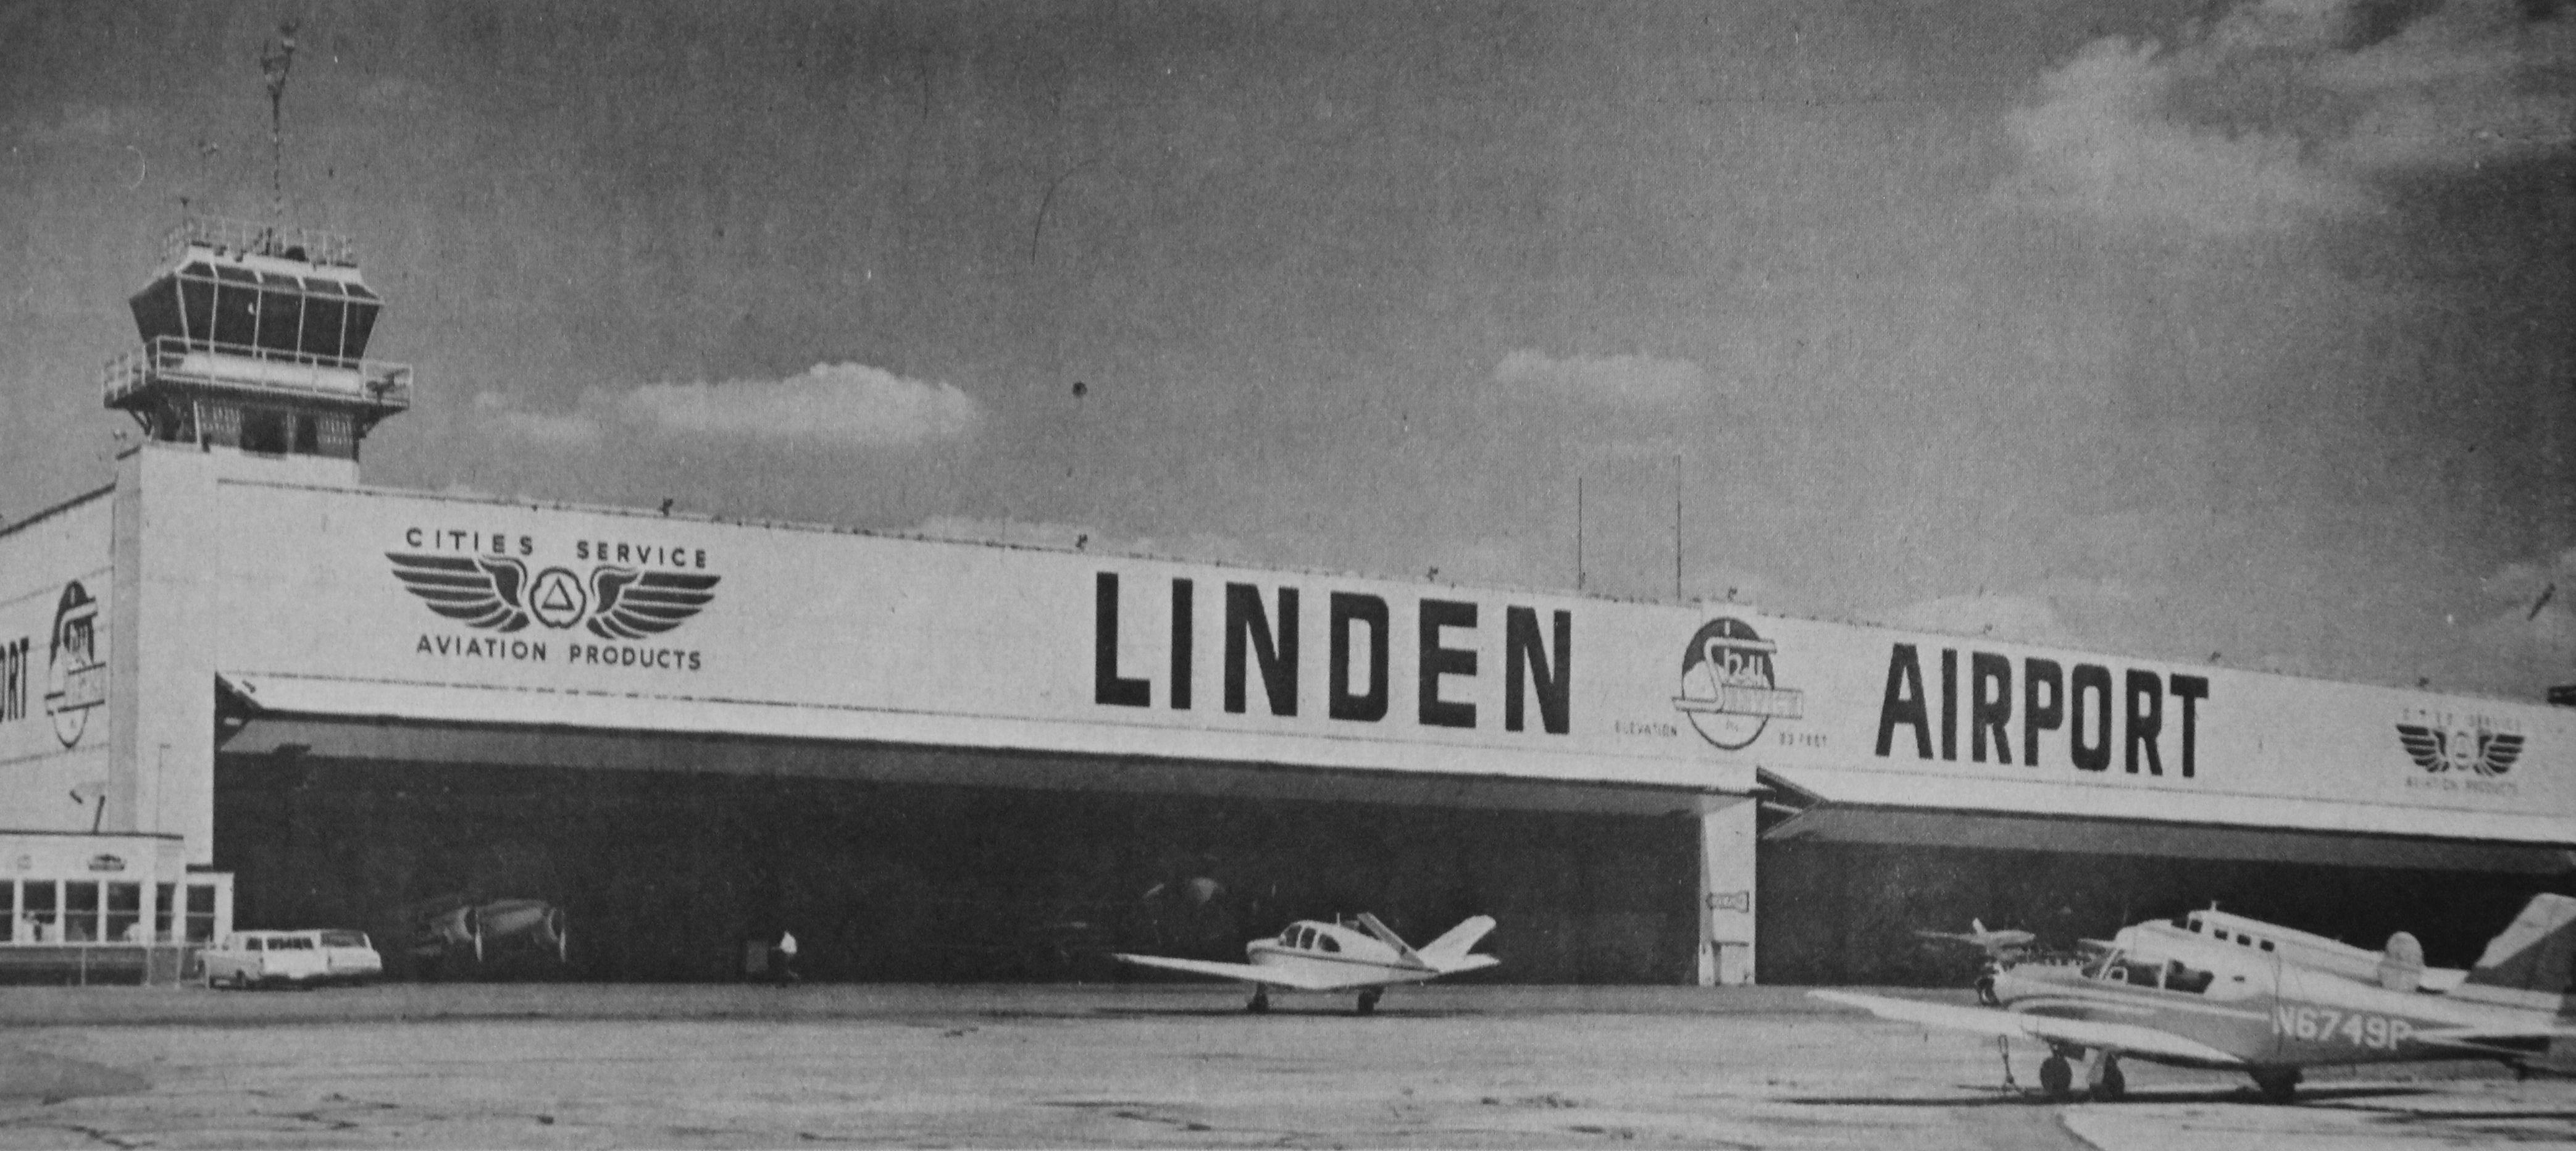 linden airport in linden nj vintage union county new jersey linden airport in linden nj 1962